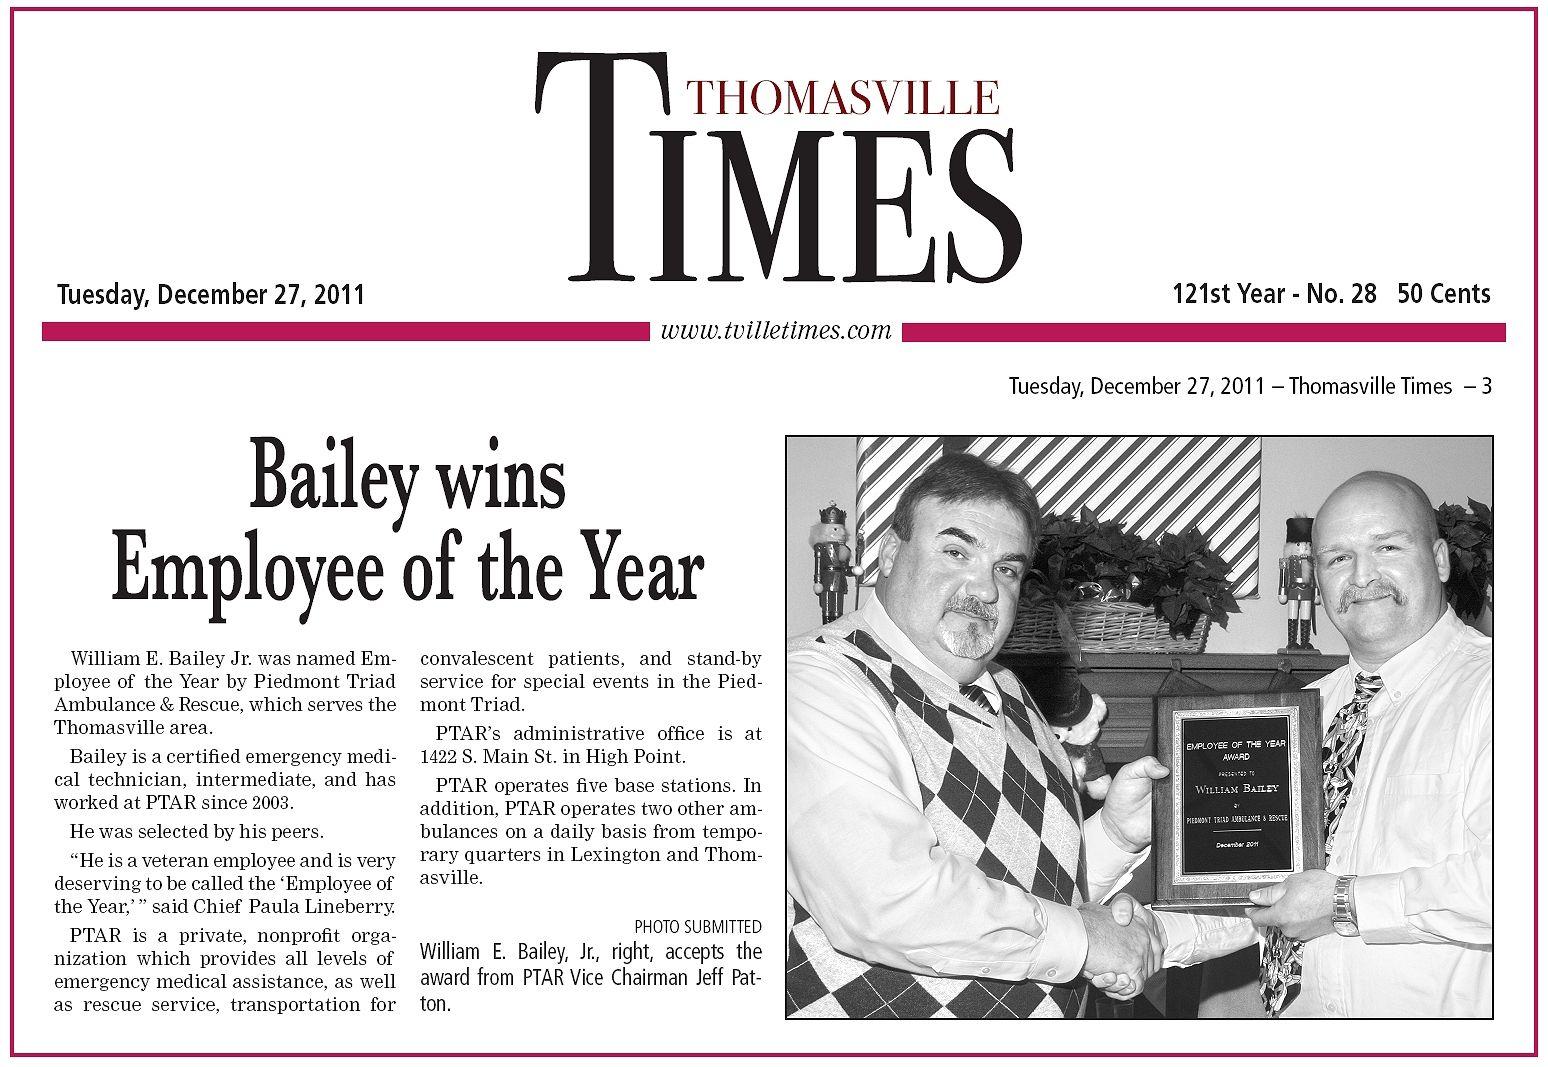 NC newspaper | Thomasville Times Newspaper